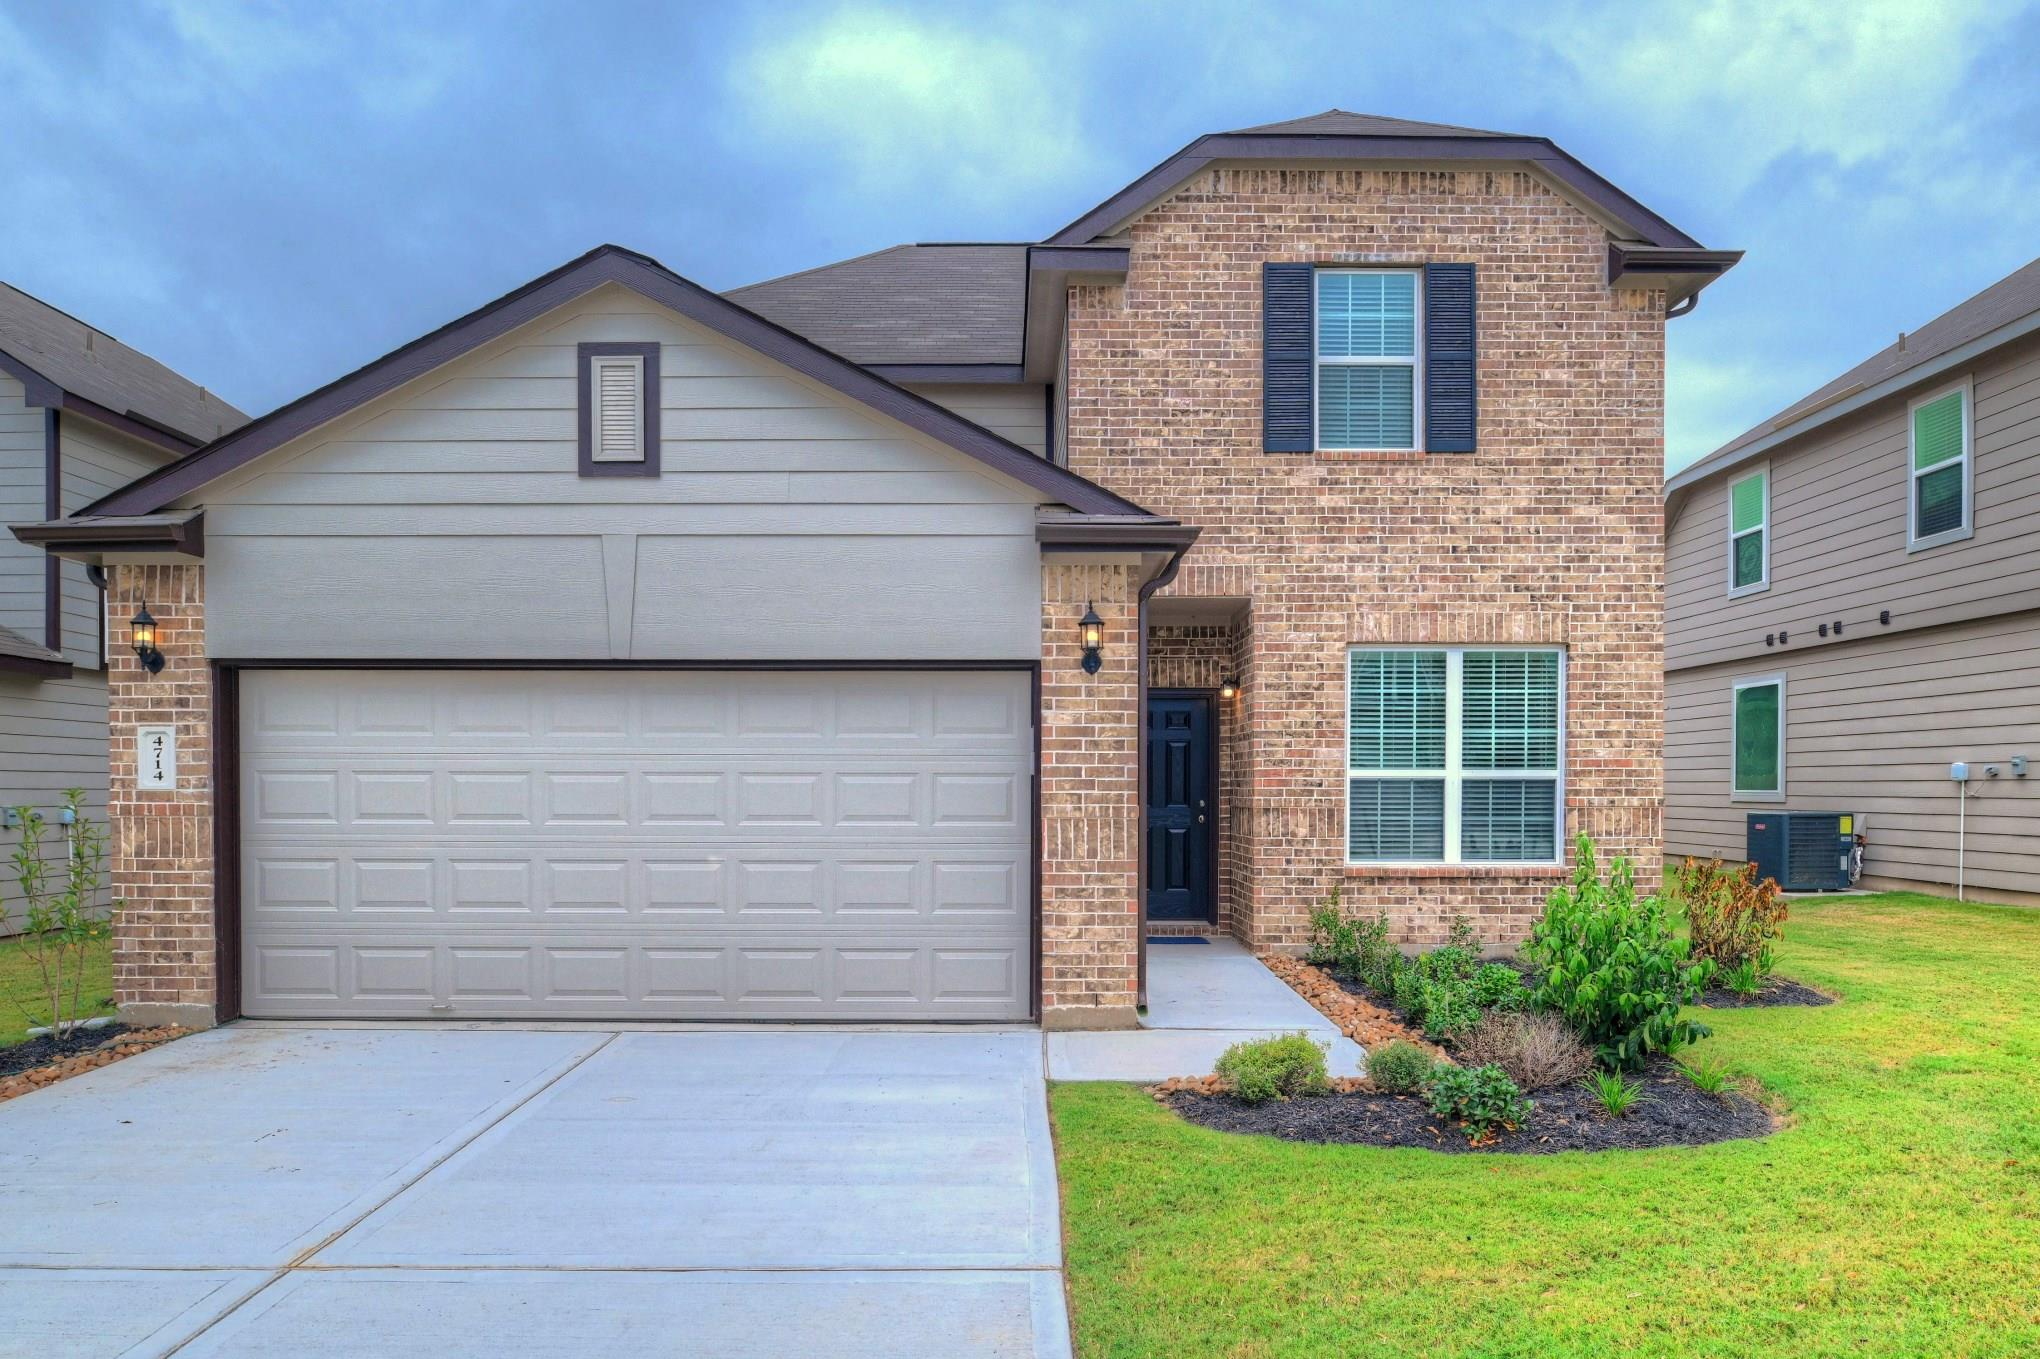 4714 Los Pines Way Property Photo - Bryan, TX real estate listing